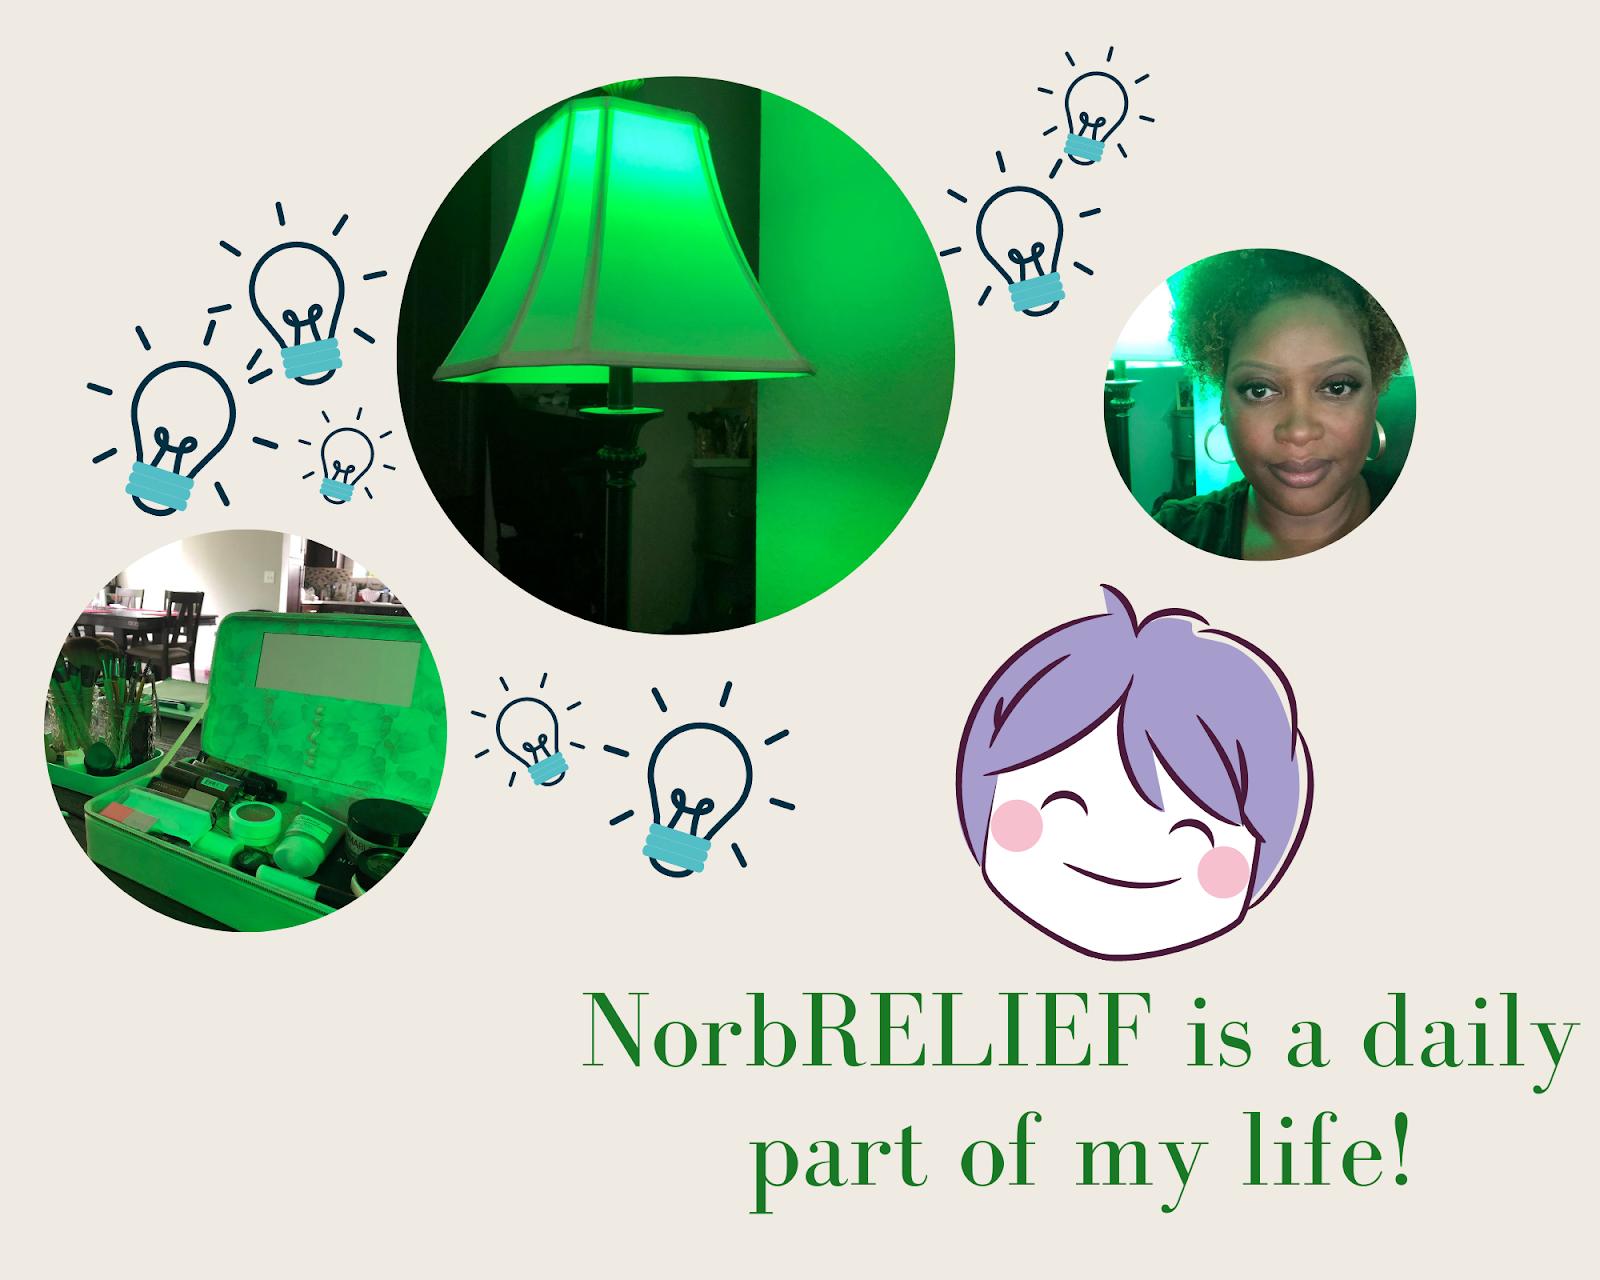 NorbRELIEF is a daily part of Jaime Sanders' life